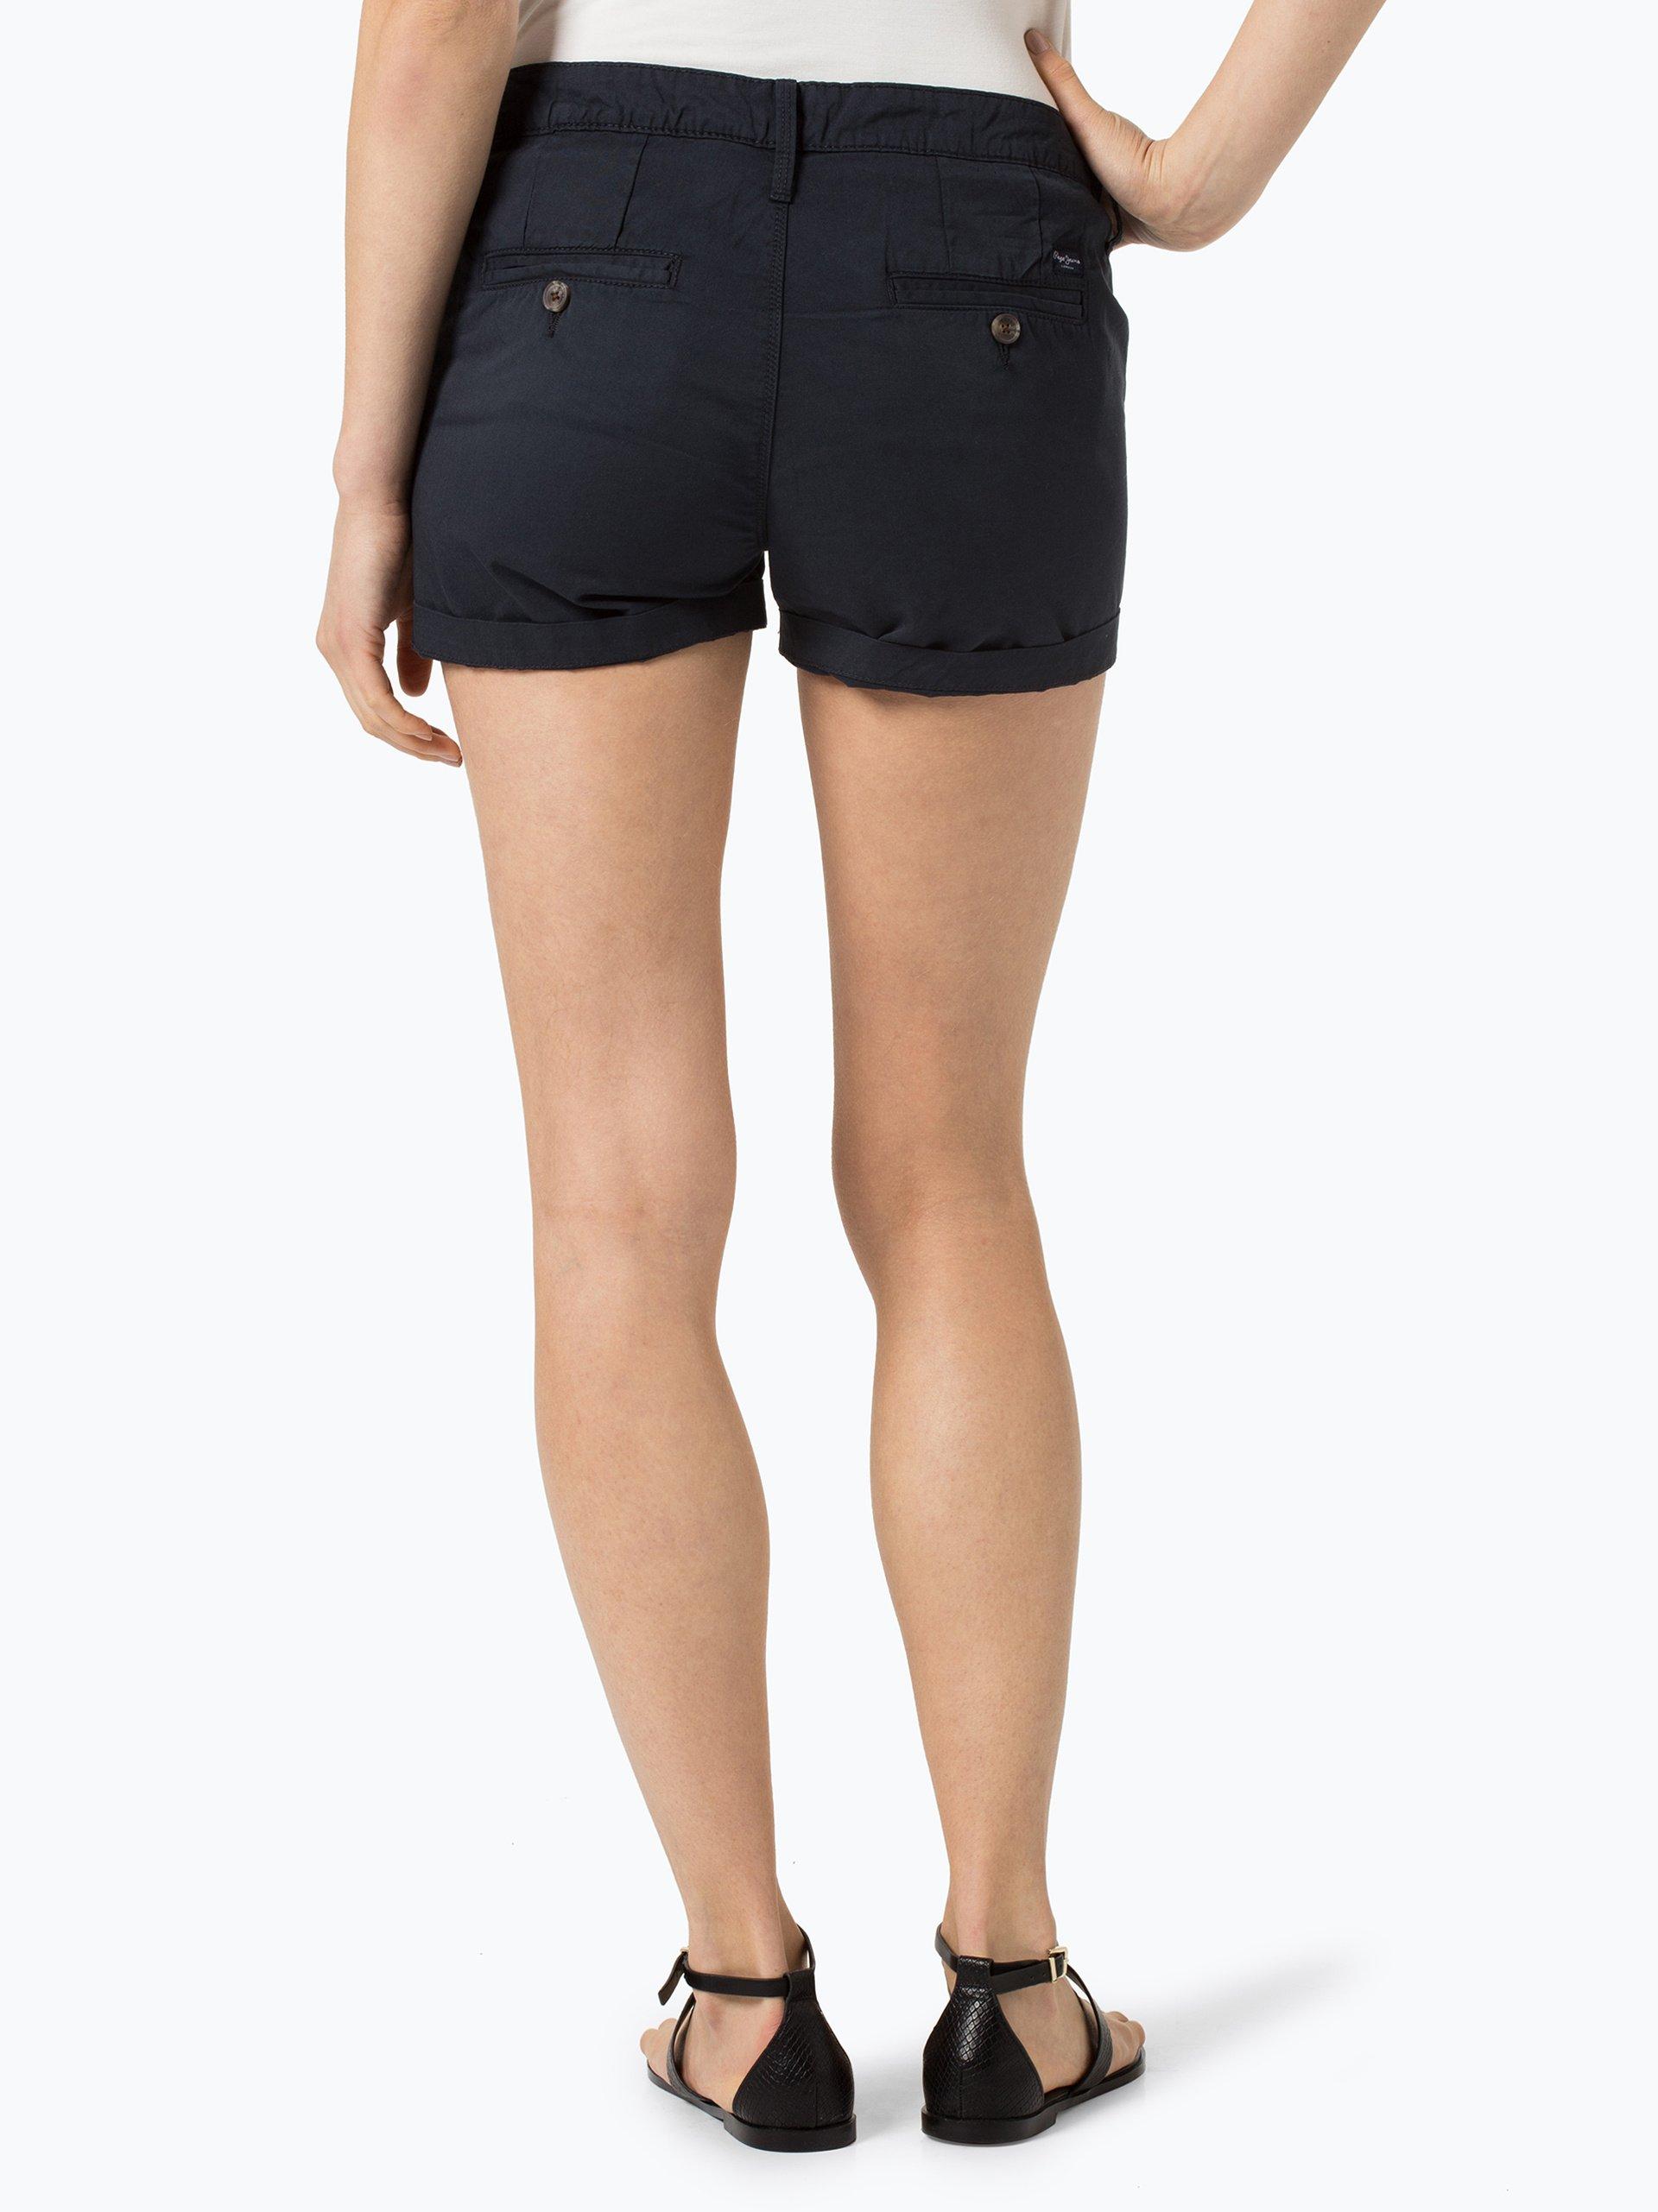 pepe jeans damen shorts balboa 2 online kaufen peek und cloppenburg de. Black Bedroom Furniture Sets. Home Design Ideas